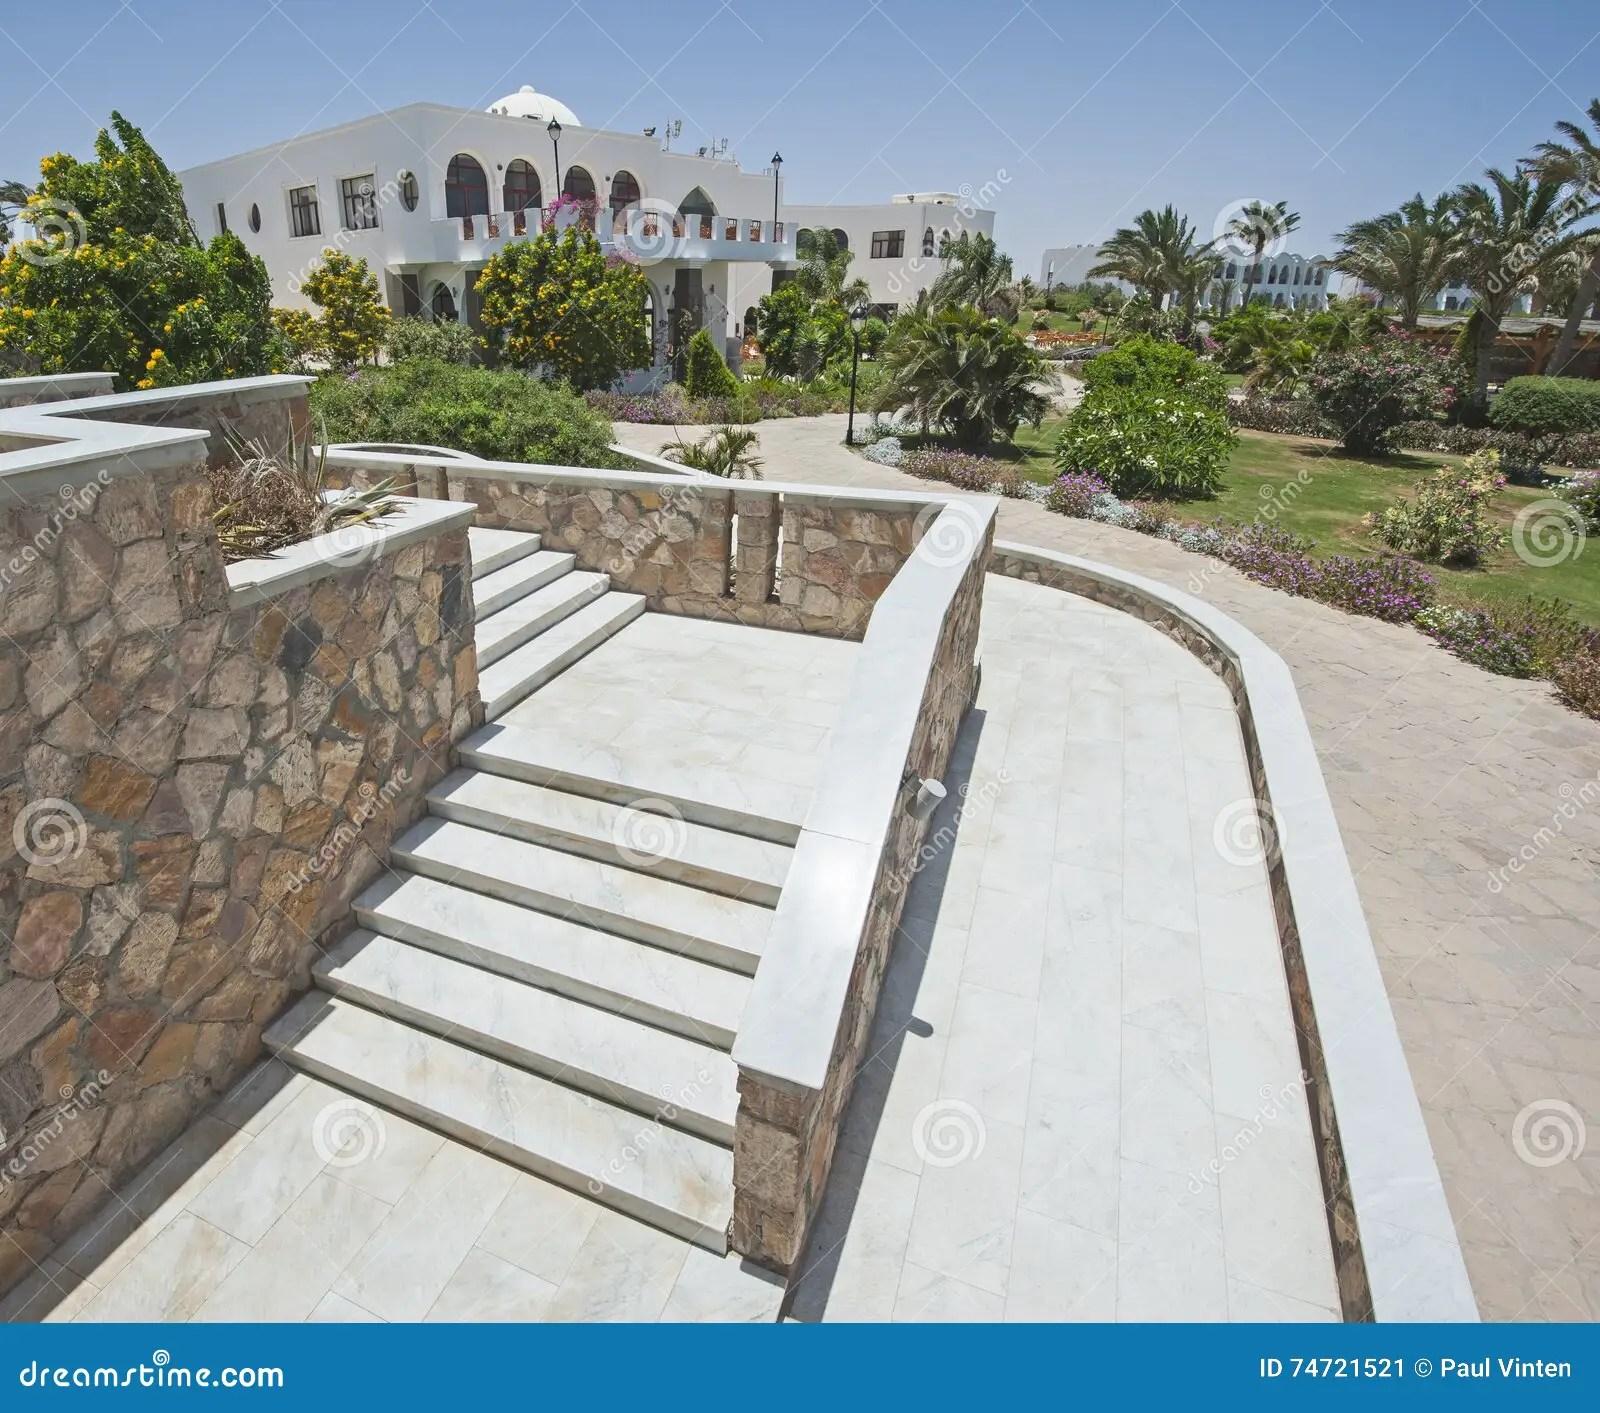 Outdoor Steps On Raised Patio Area Stock Image - Image of ... on Backyard Patio Steps id=64649